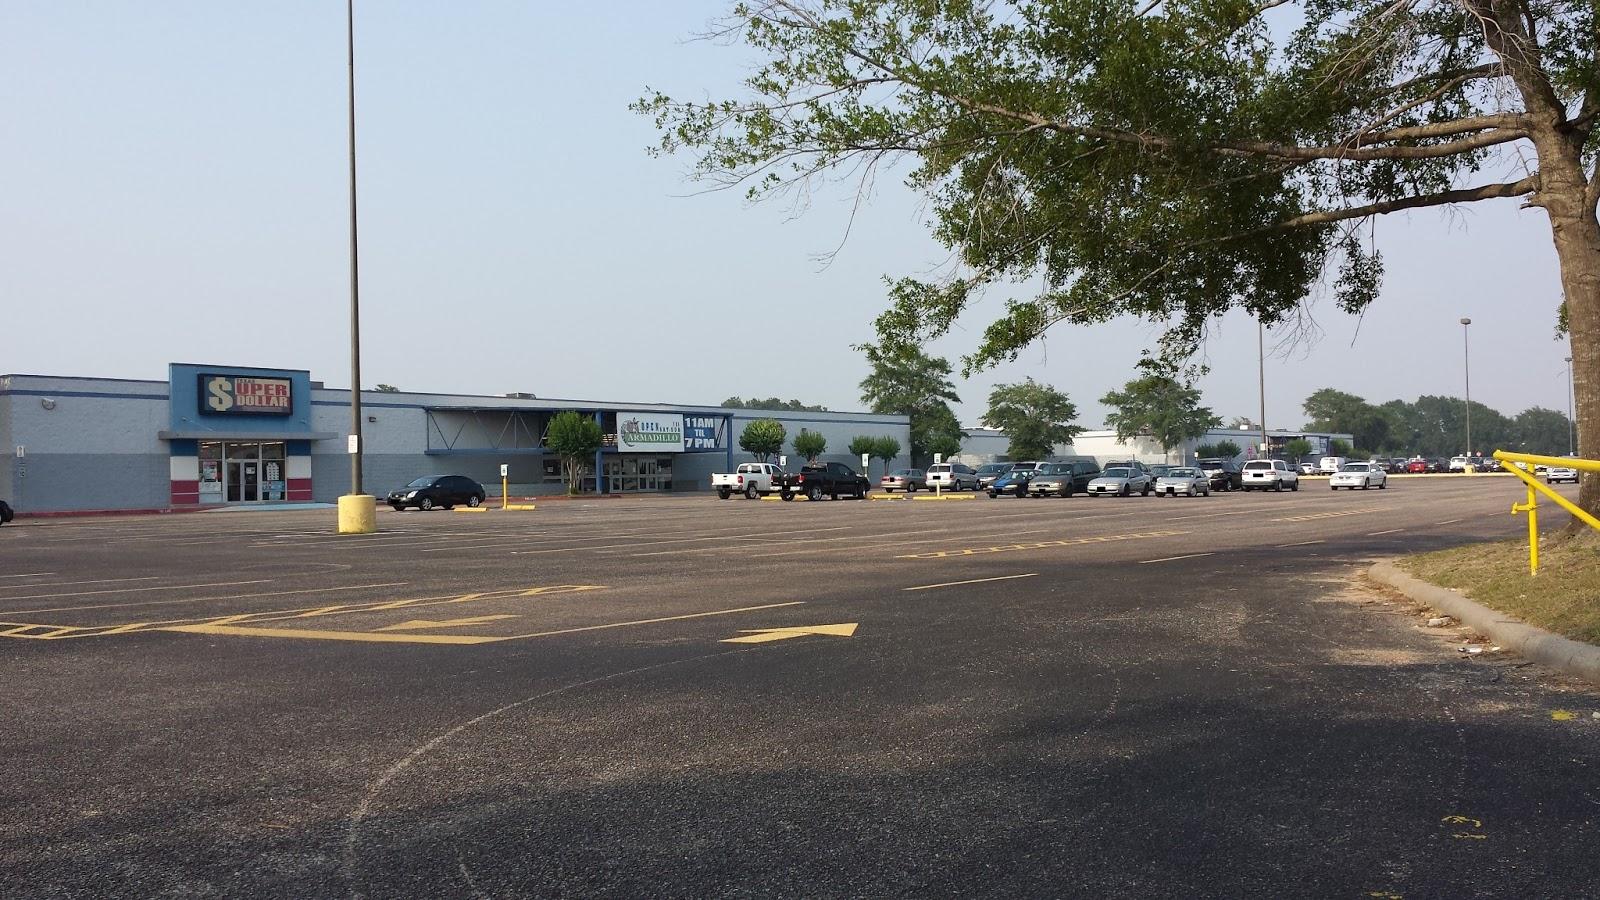 Louisiana And Texas Southern Malls And Retail: Buyeru0027s Market Mall North Houston  Texas